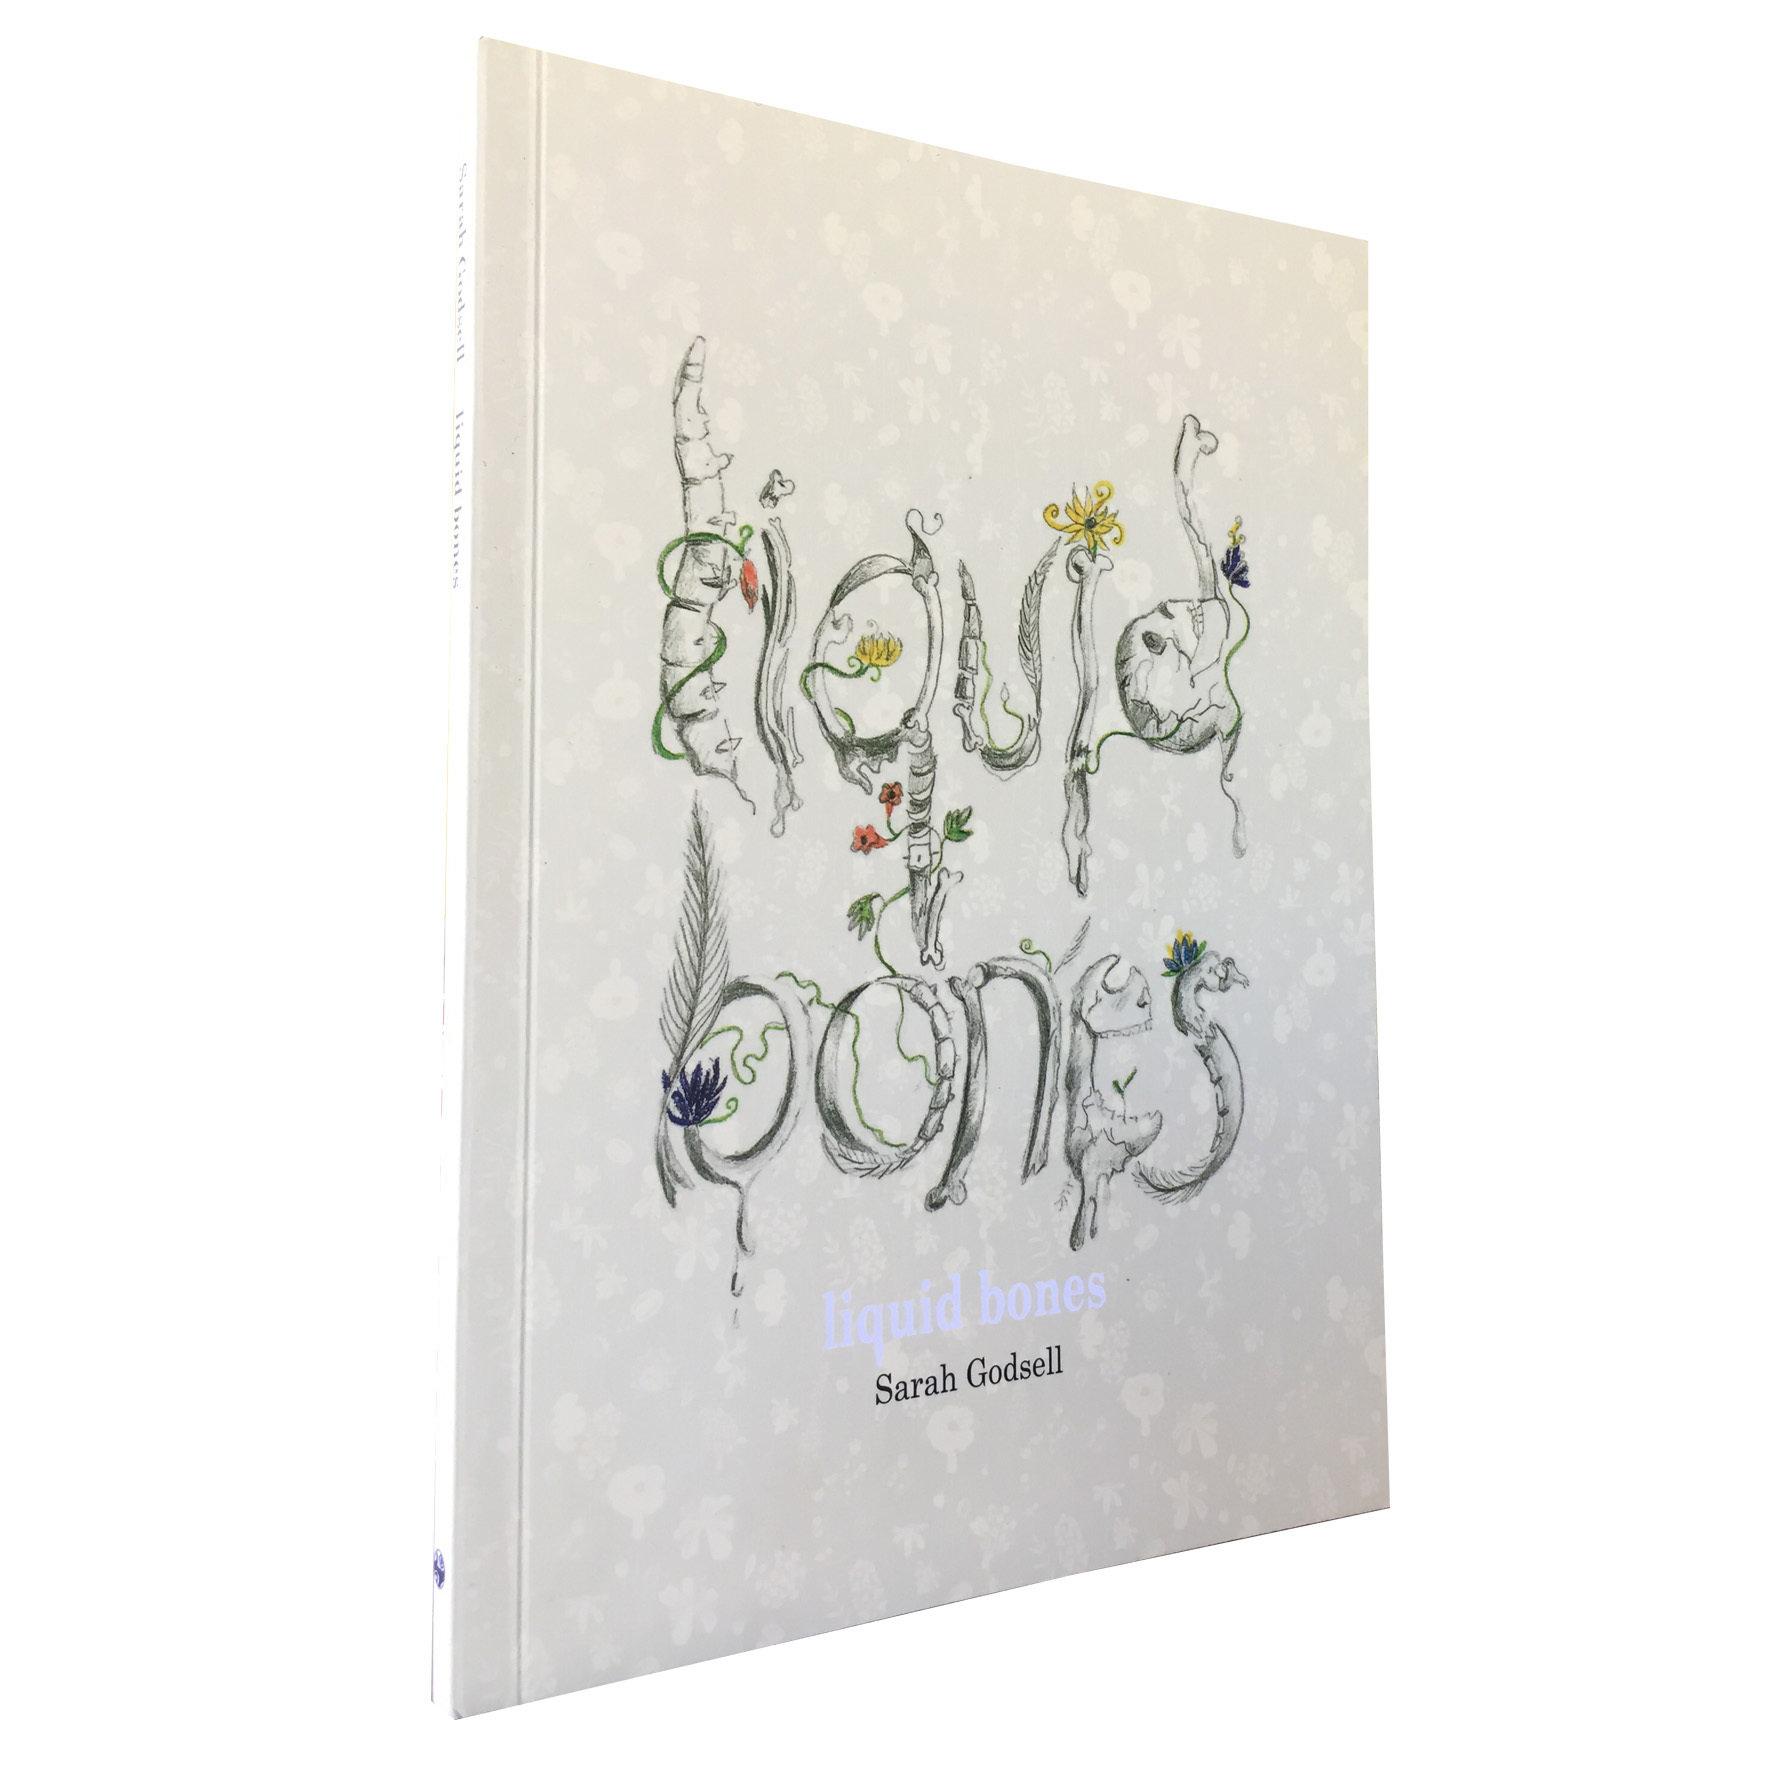 Liquid Bones by Sarah Godsell (Impepho Press) IP01